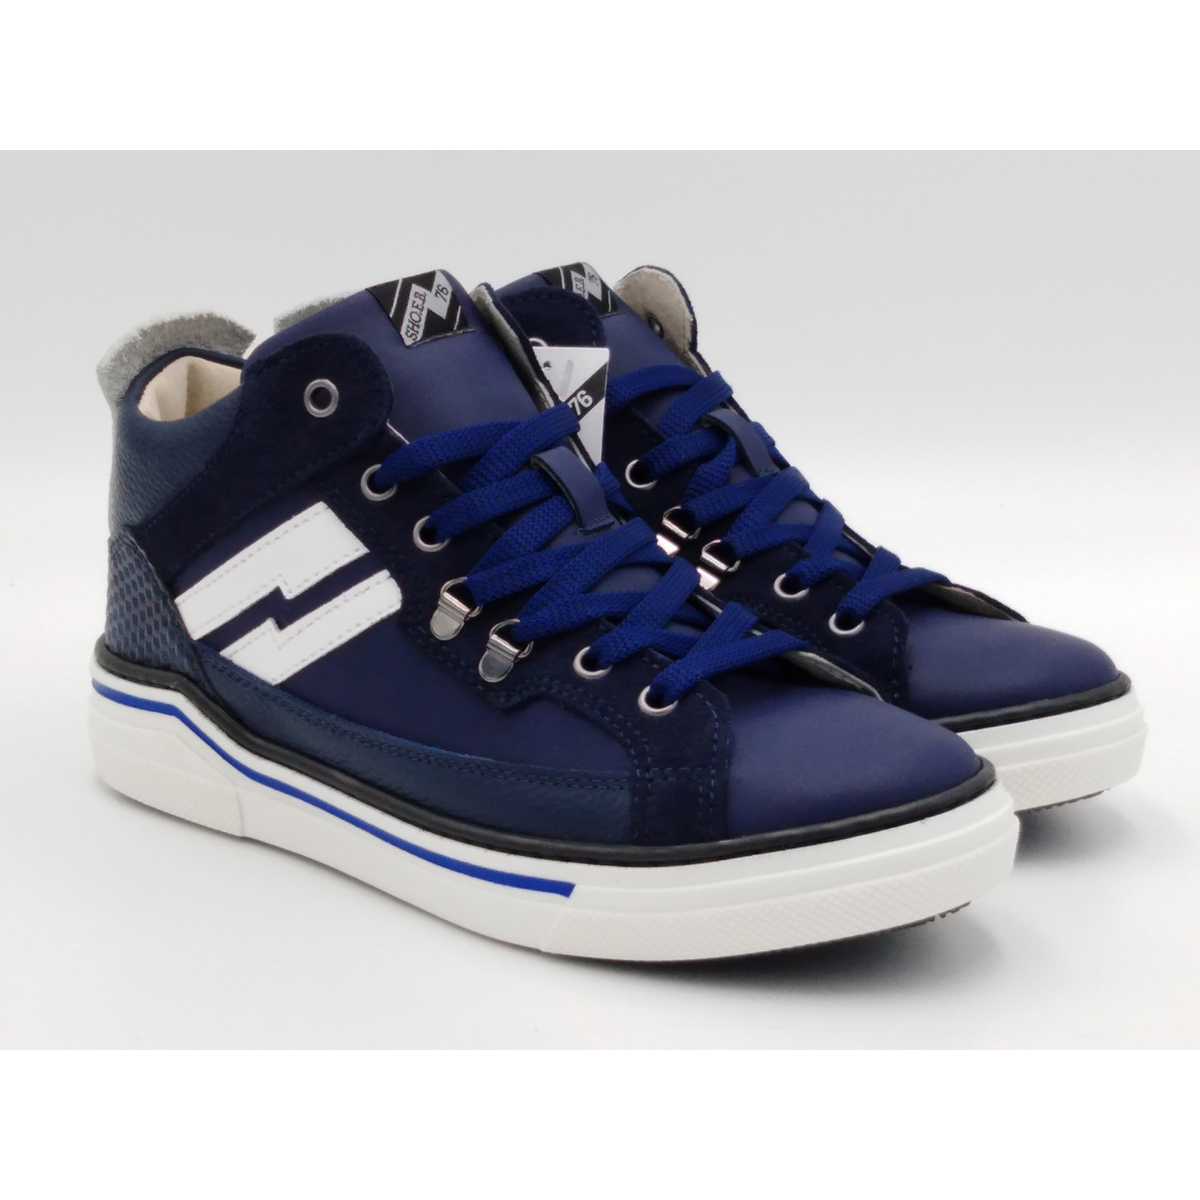 SHO.E.B.76 -Sneaker lacci blu